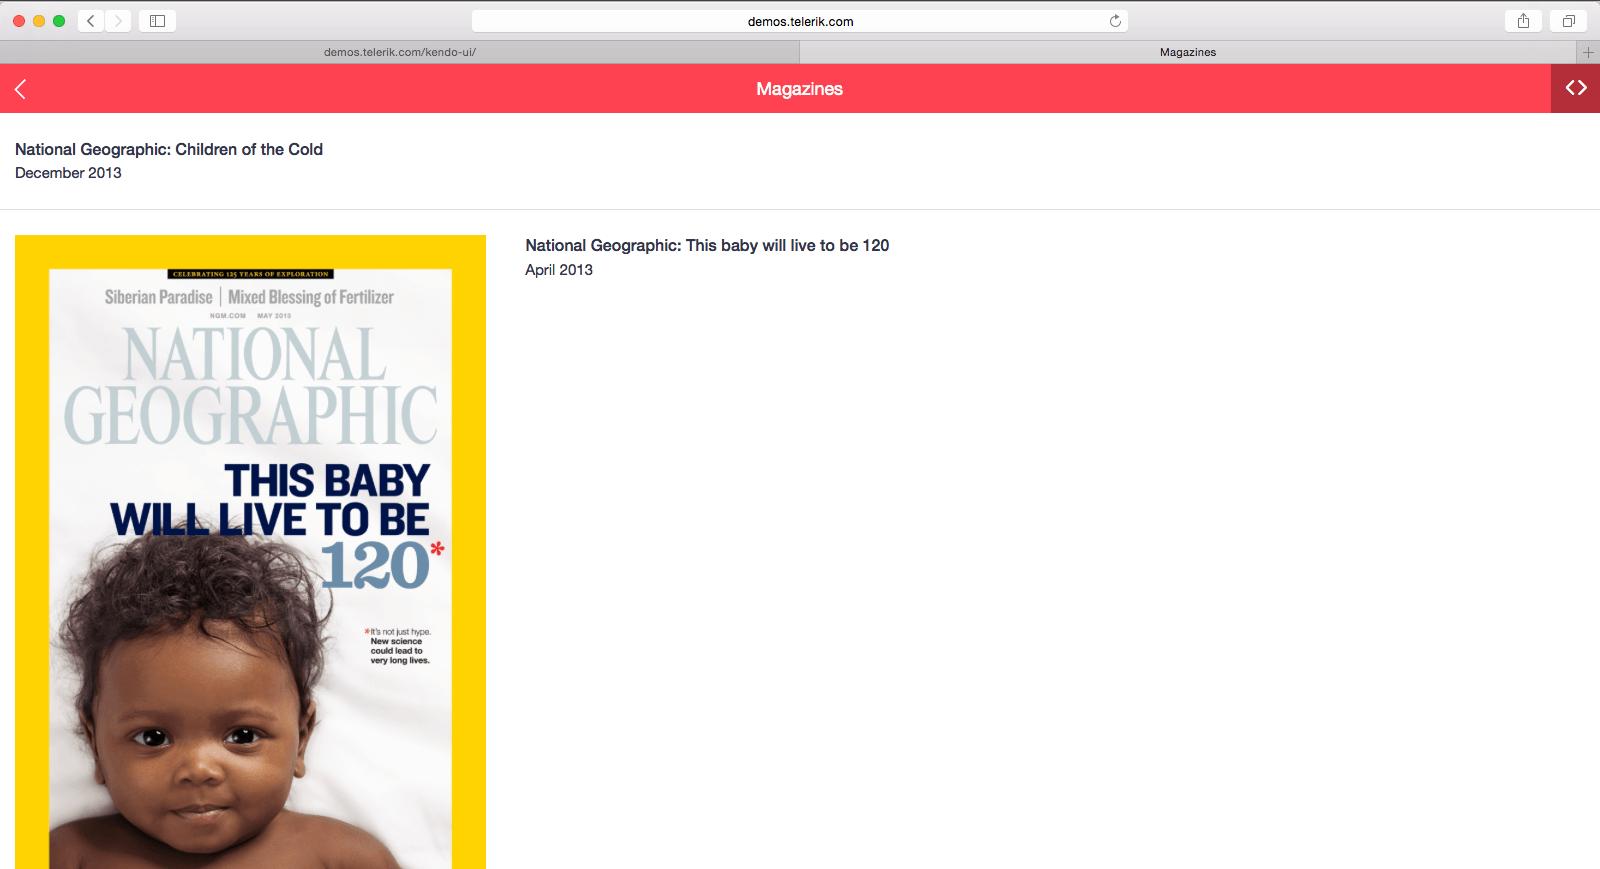 Screenshot 2015-07-02 15.04.09